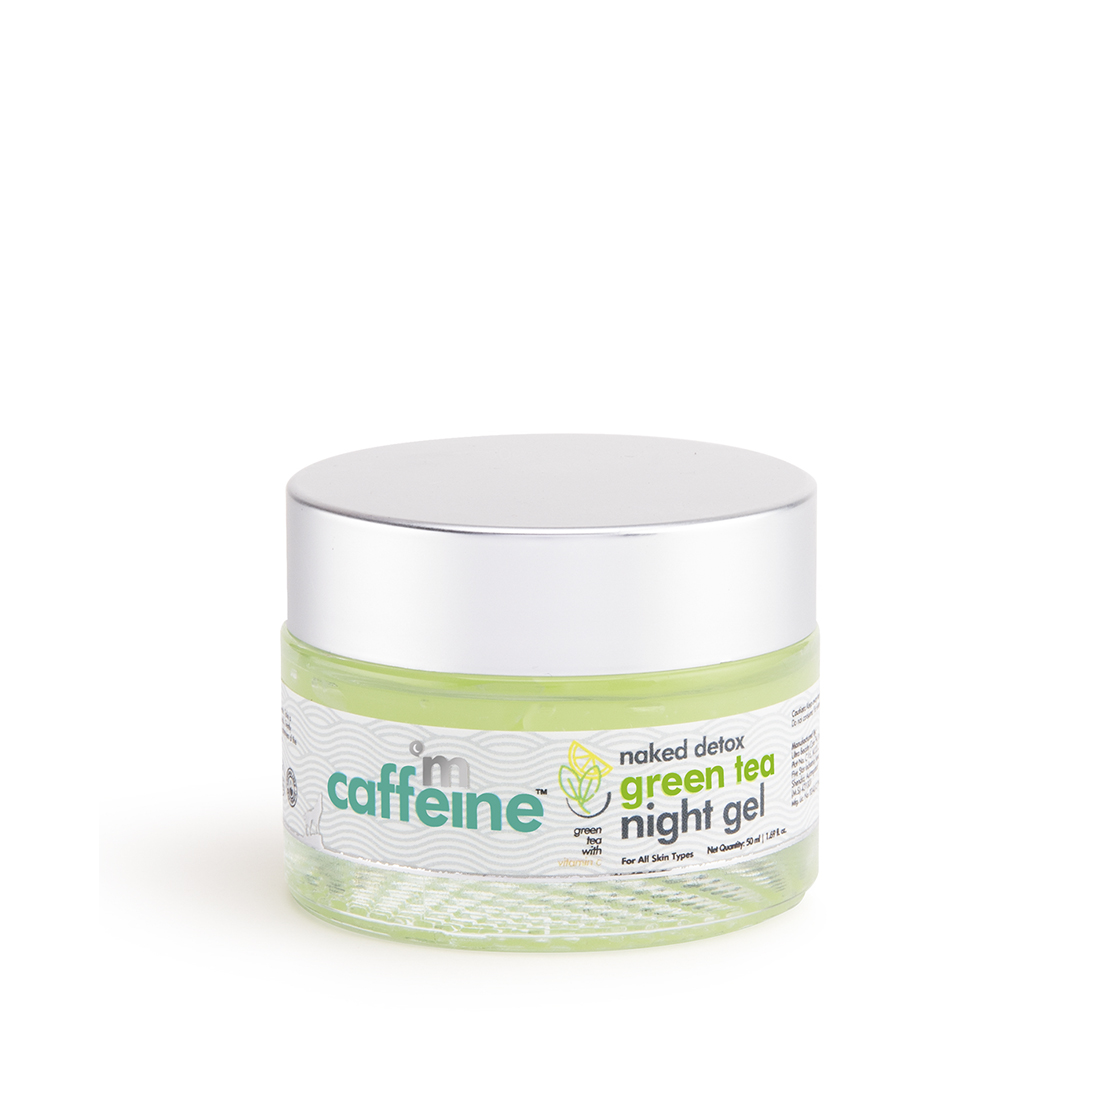 MCaffeine   mCaffeine Naked Detox Hydrating Green Tea Night Gel (50 ml)